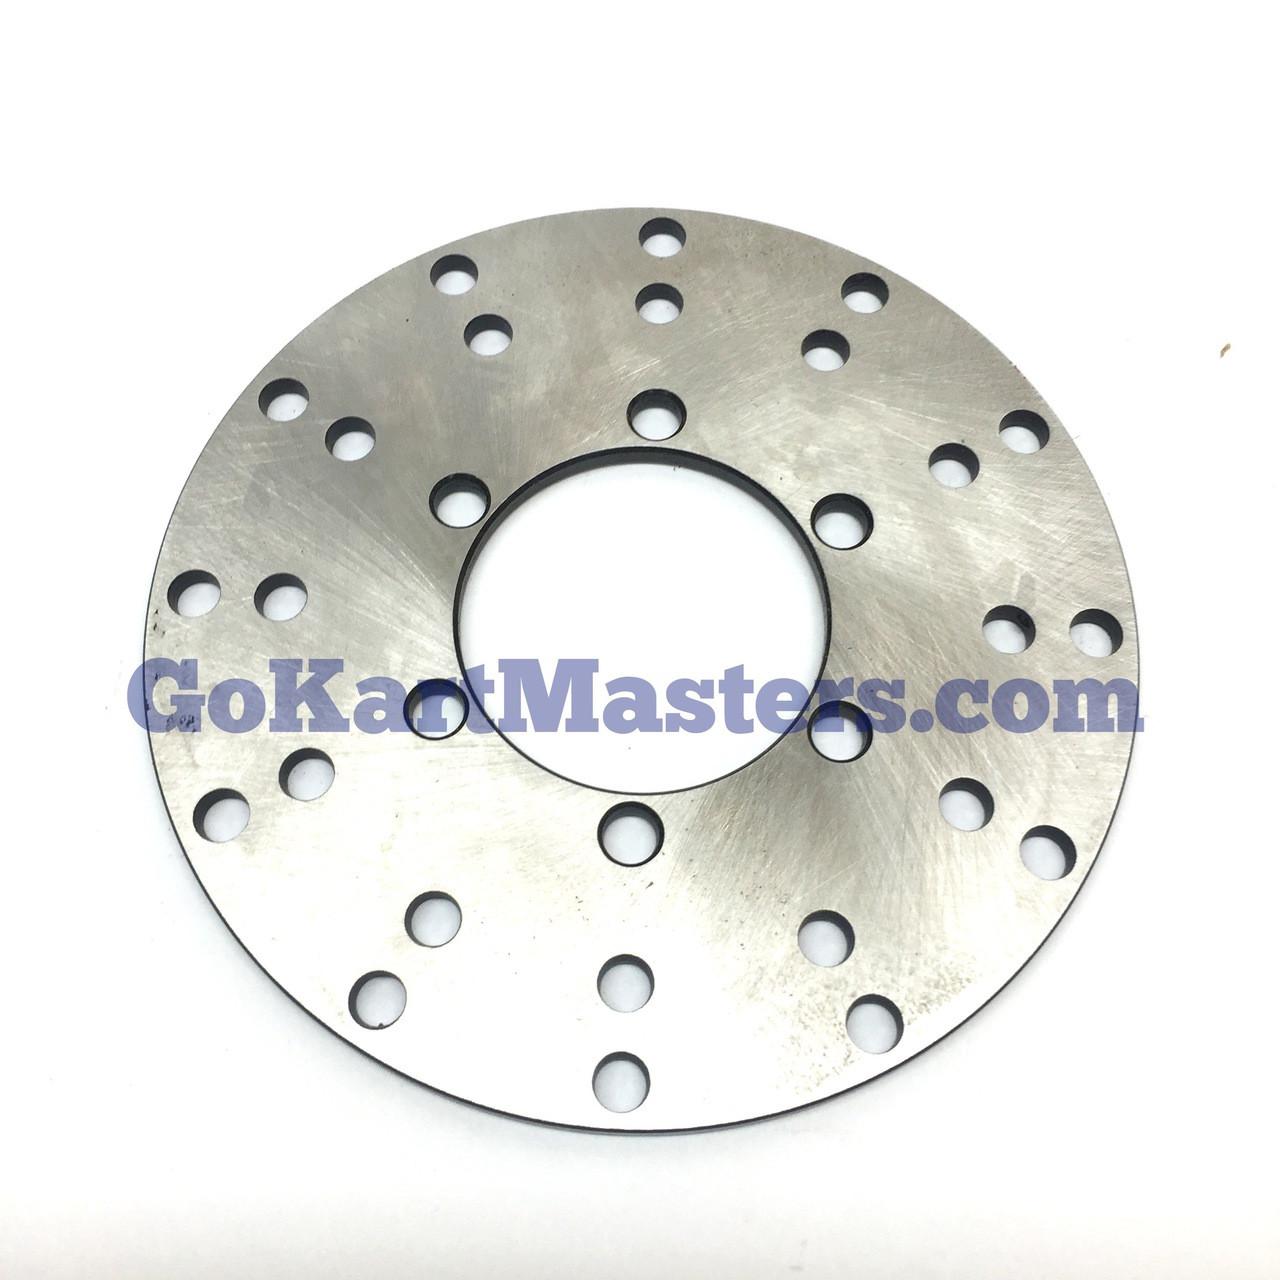 TrailMaster 150 XRS & 150 XRX Front Brake Disc